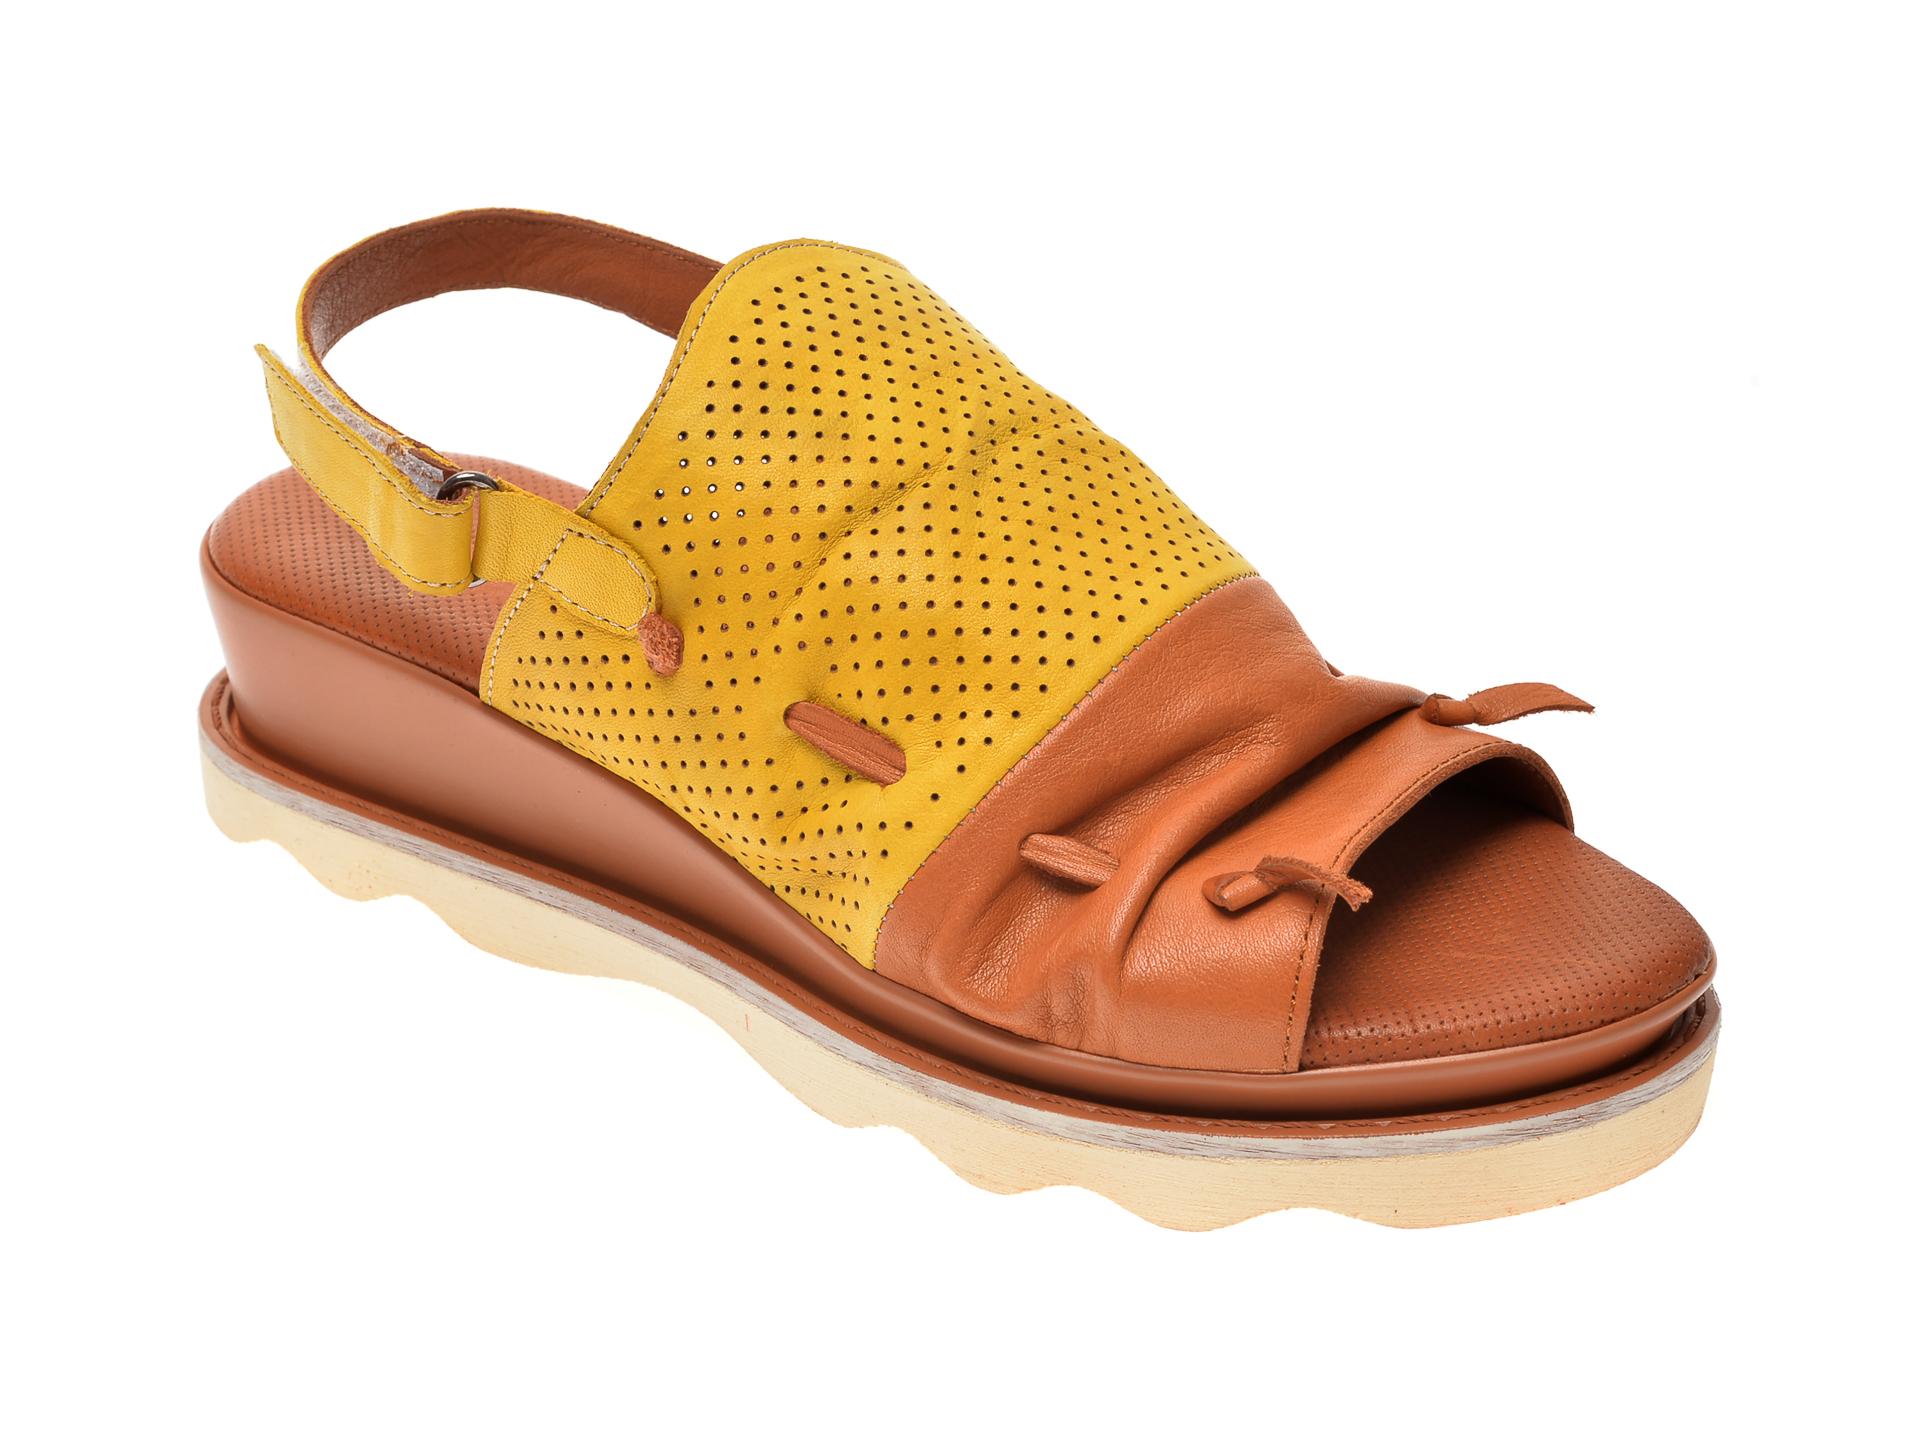 Sandale FLAVIA PASSINI galbene, 0206, din piele naturala